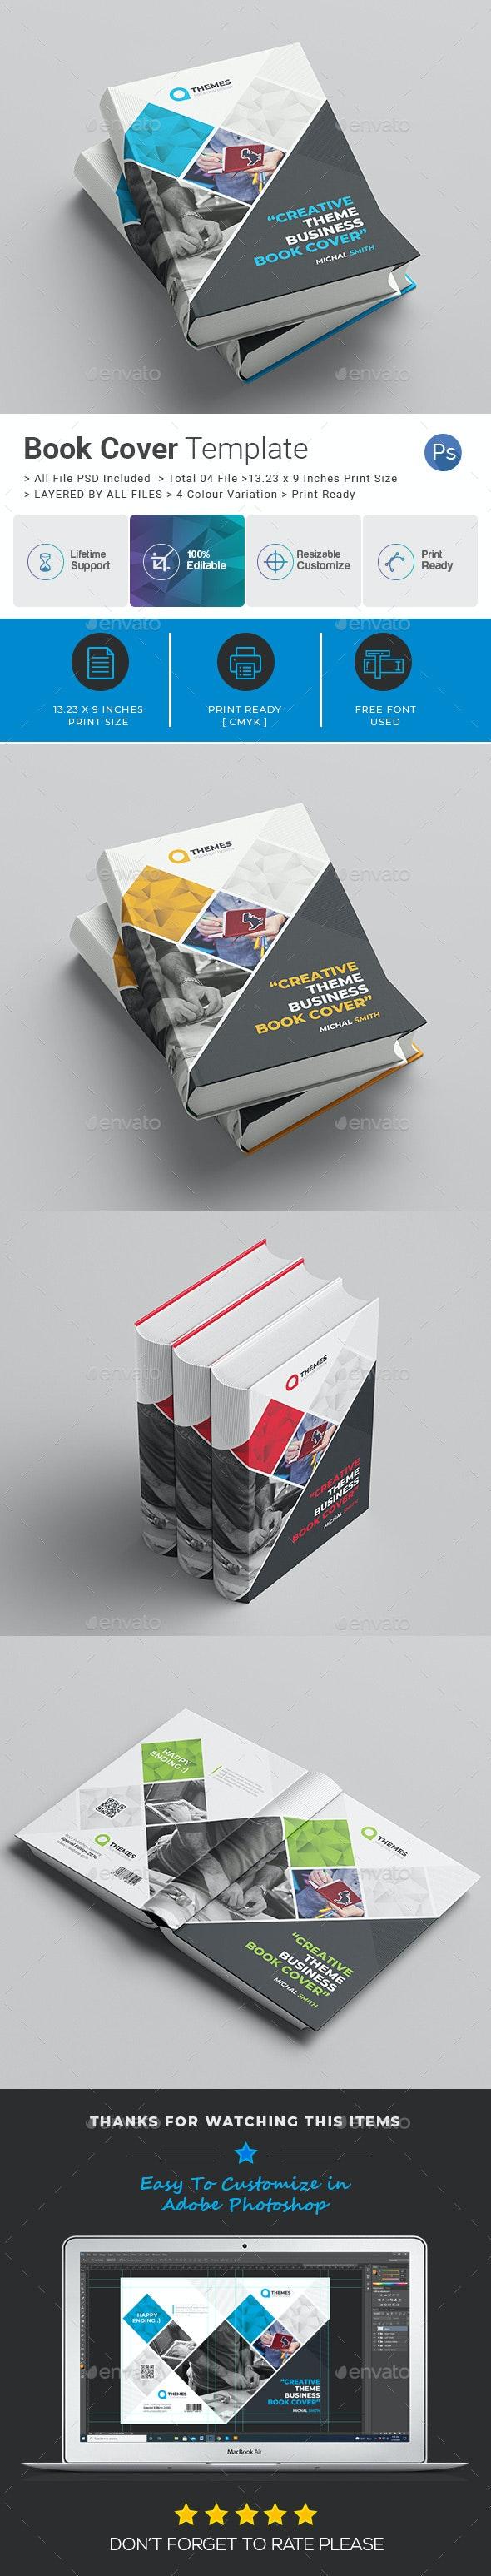 Book Cover Template Vol-3 - Miscellaneous Print Templates